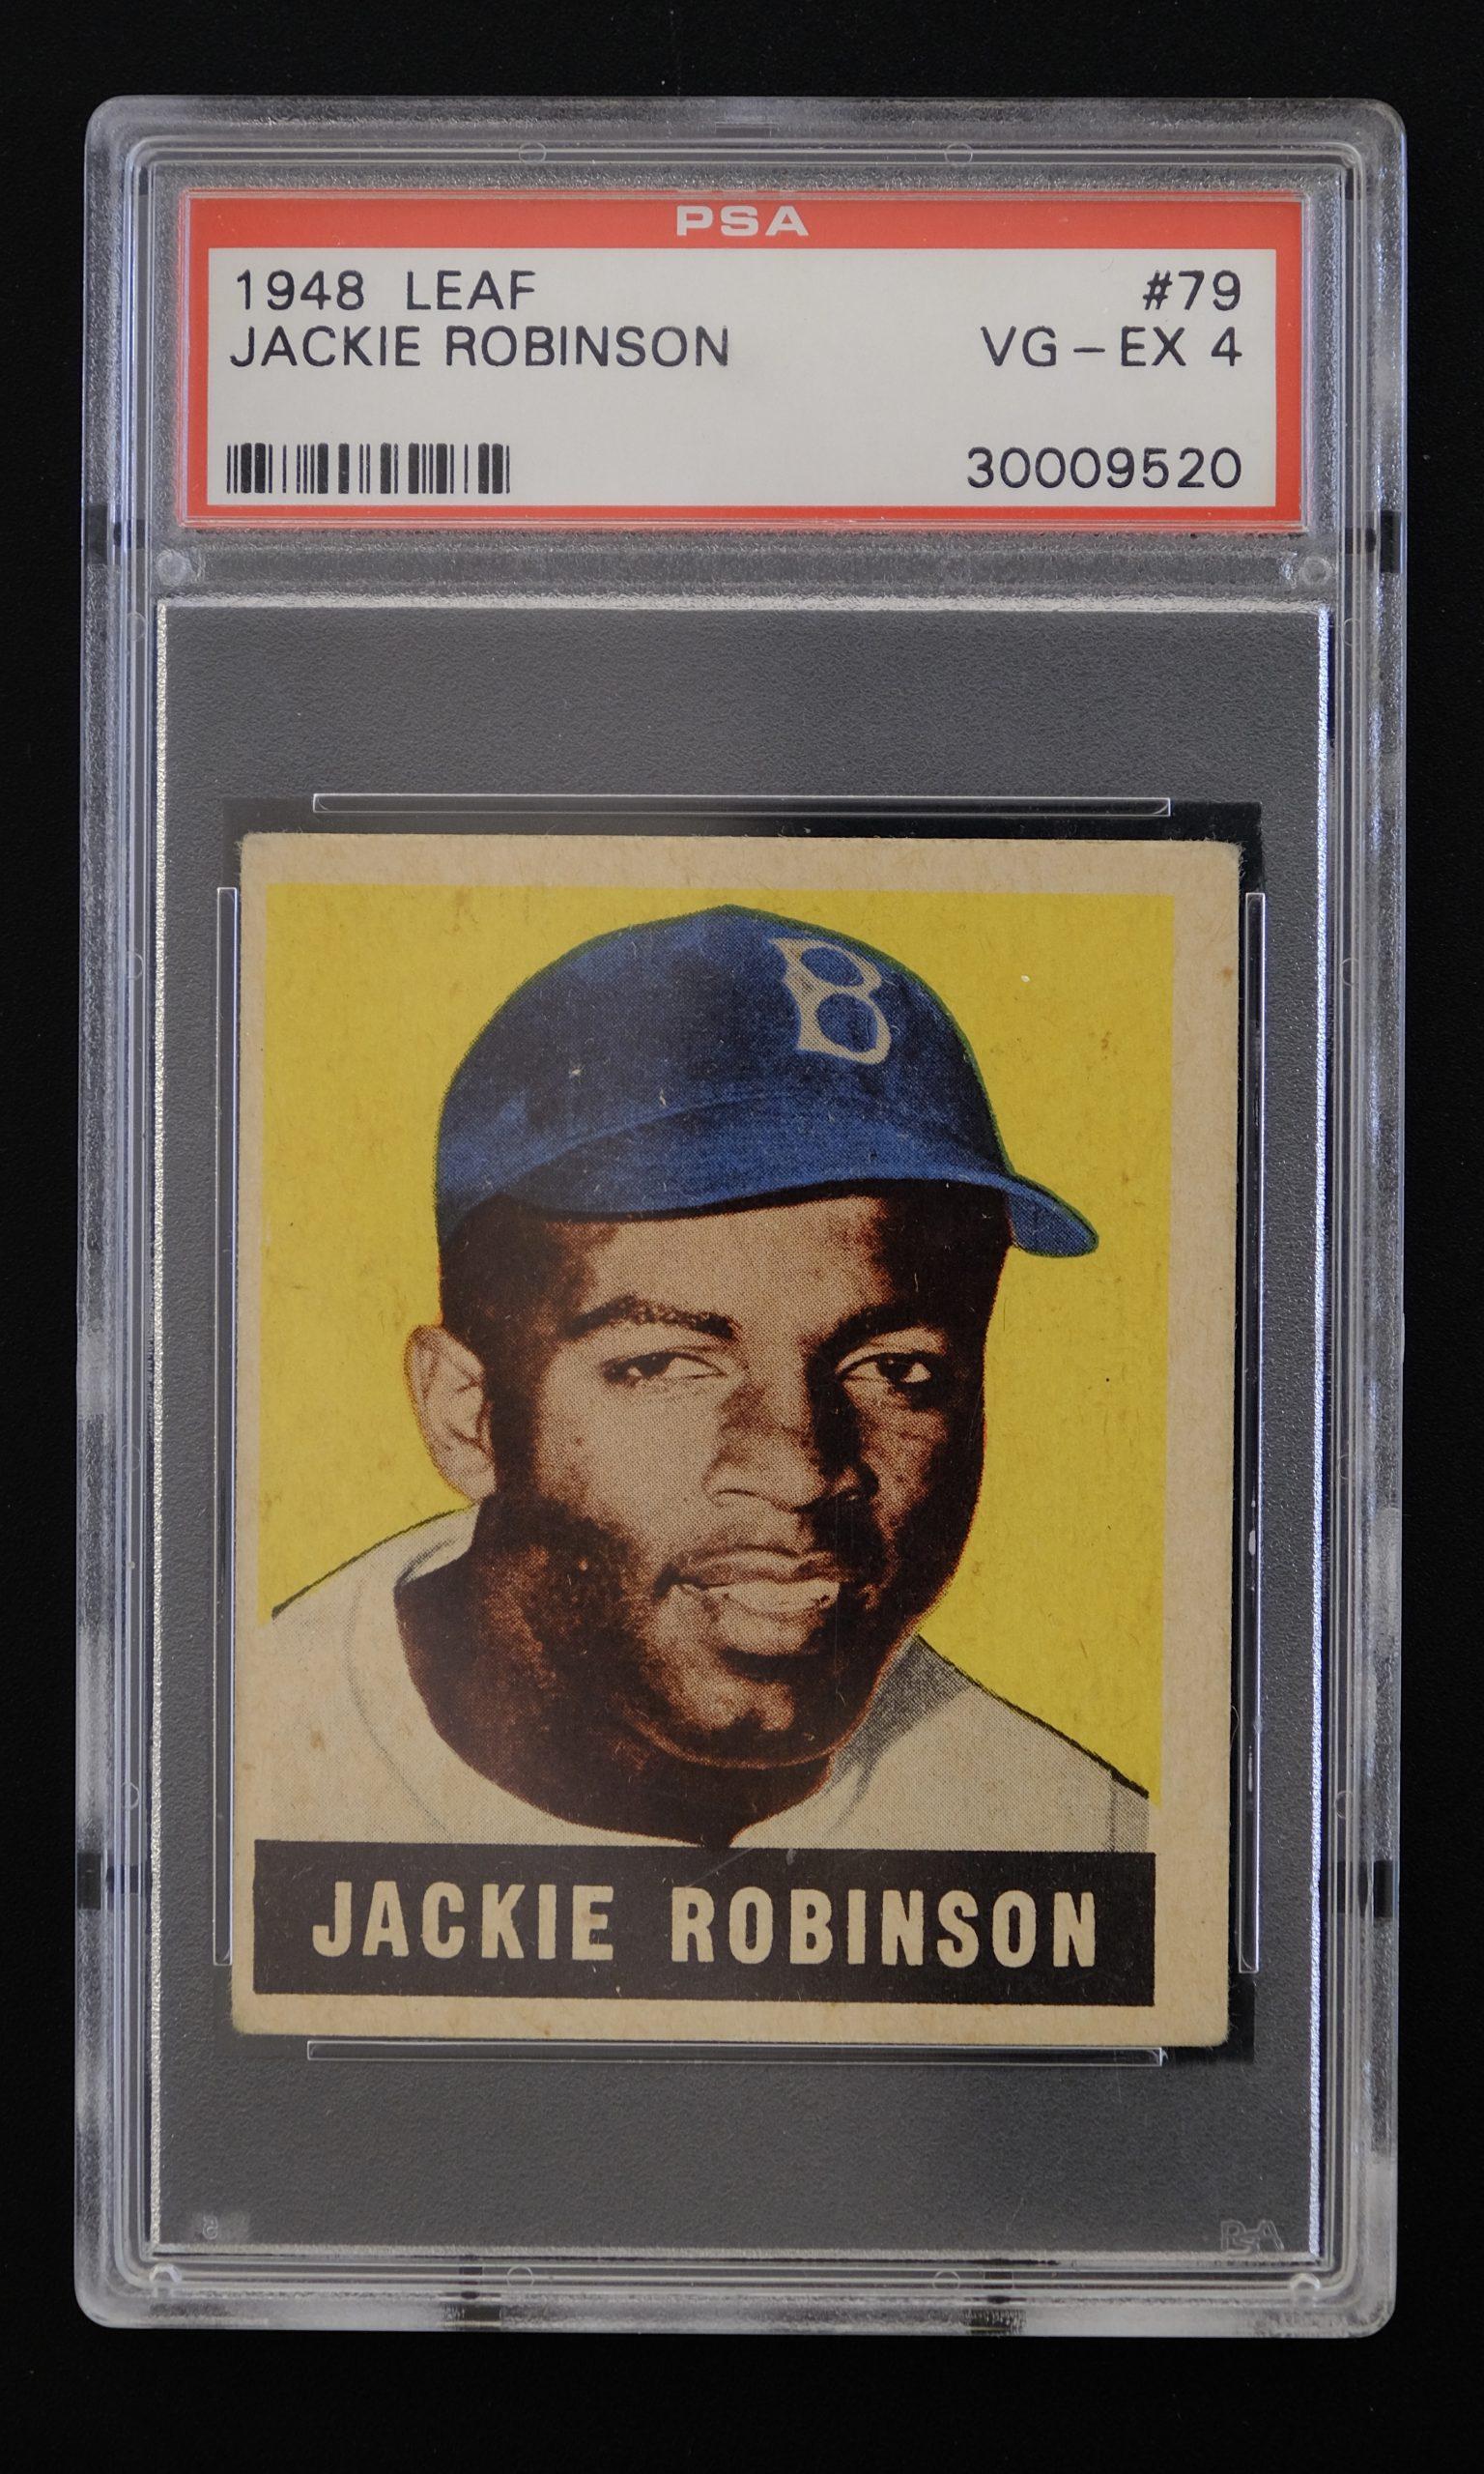 Jackie Robinson card, 1948